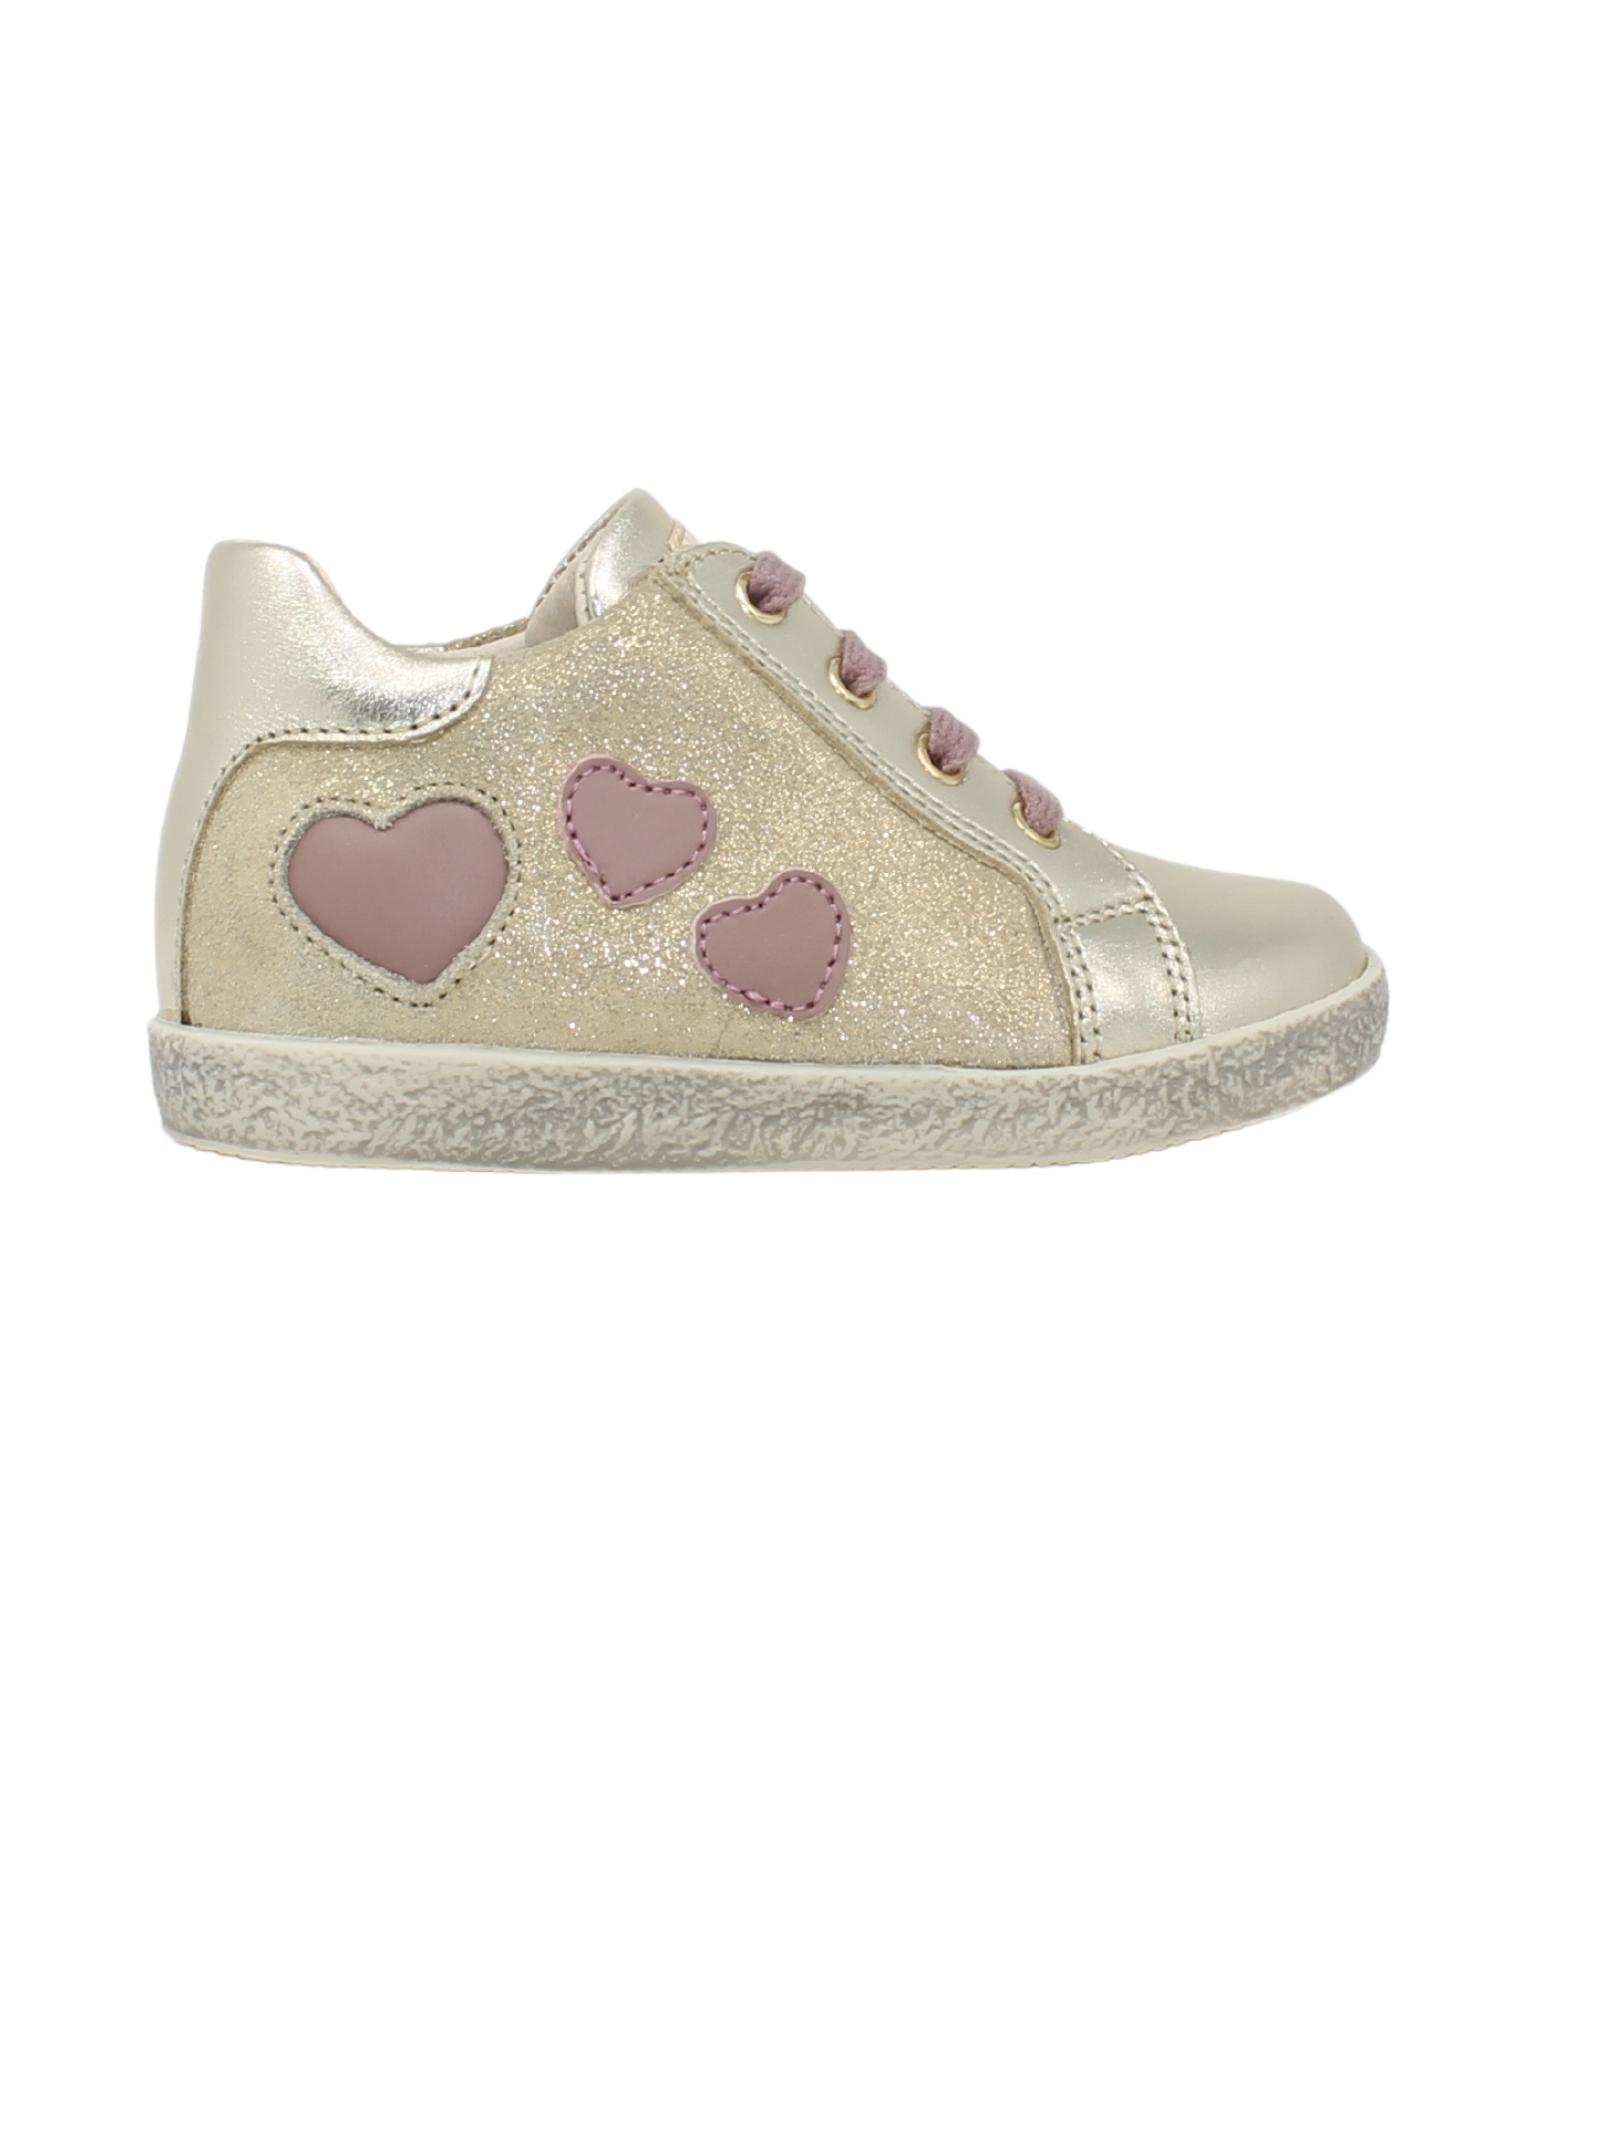 Sinta Girls sneakers FALCOTTO | Sneakers | 0012016114021Q20PLATINUM PINK